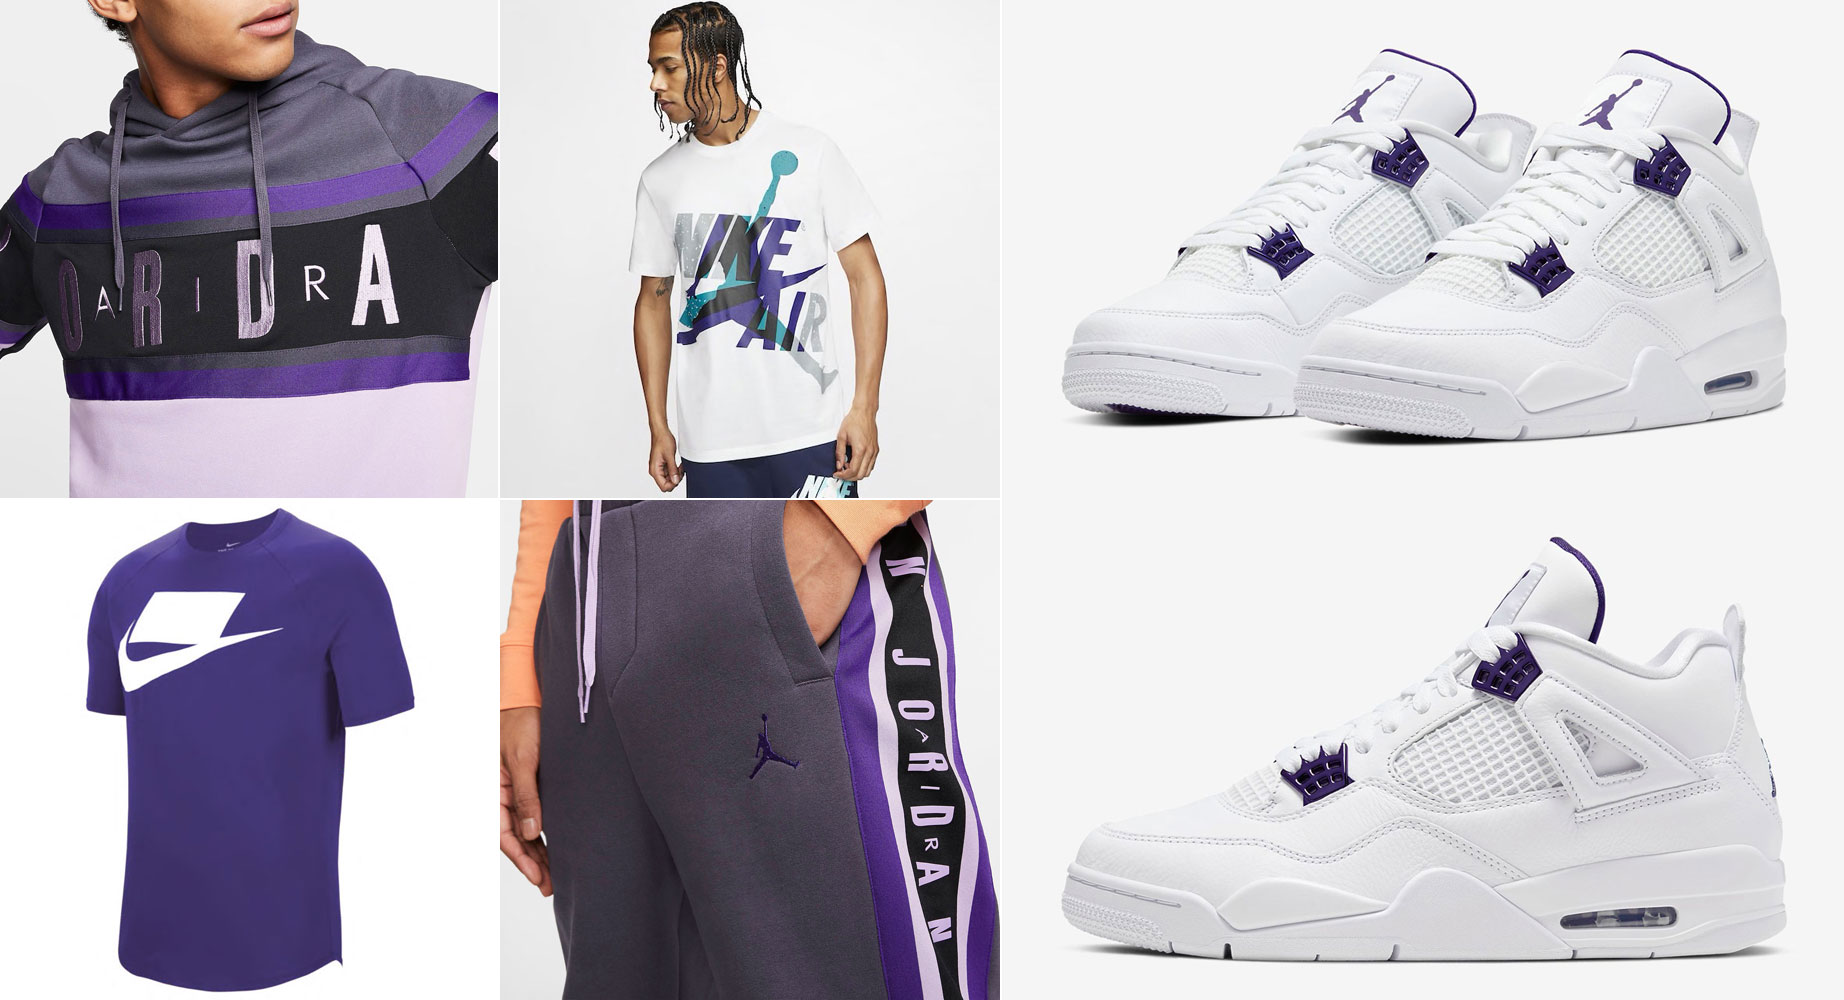 air-jordan-4-metallic-purple-clothing-outfits